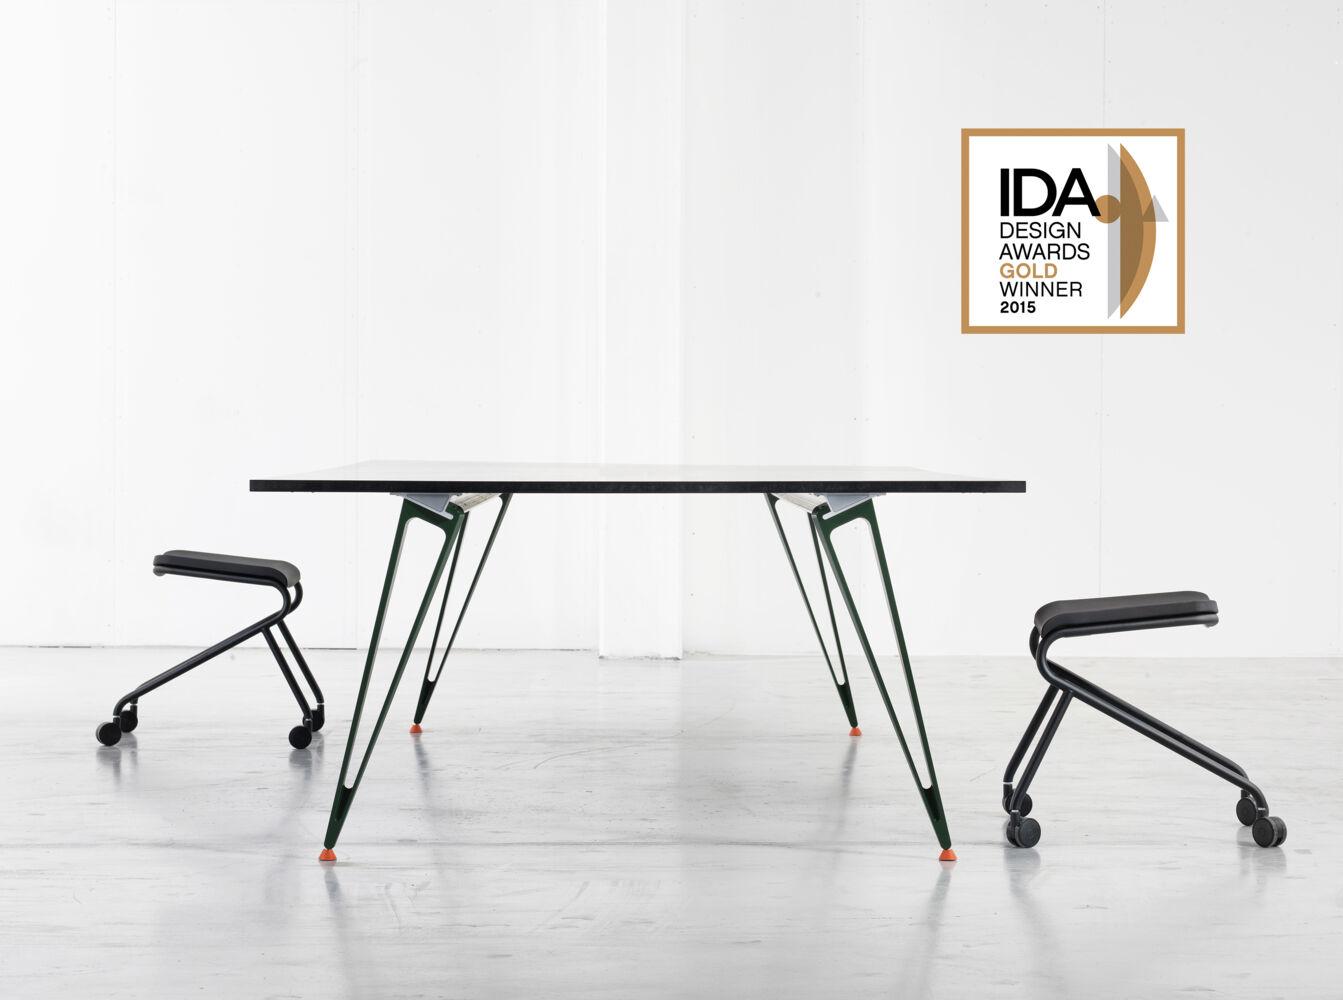 Charmant Attach Table U2013 International Design Awards Gold Winner